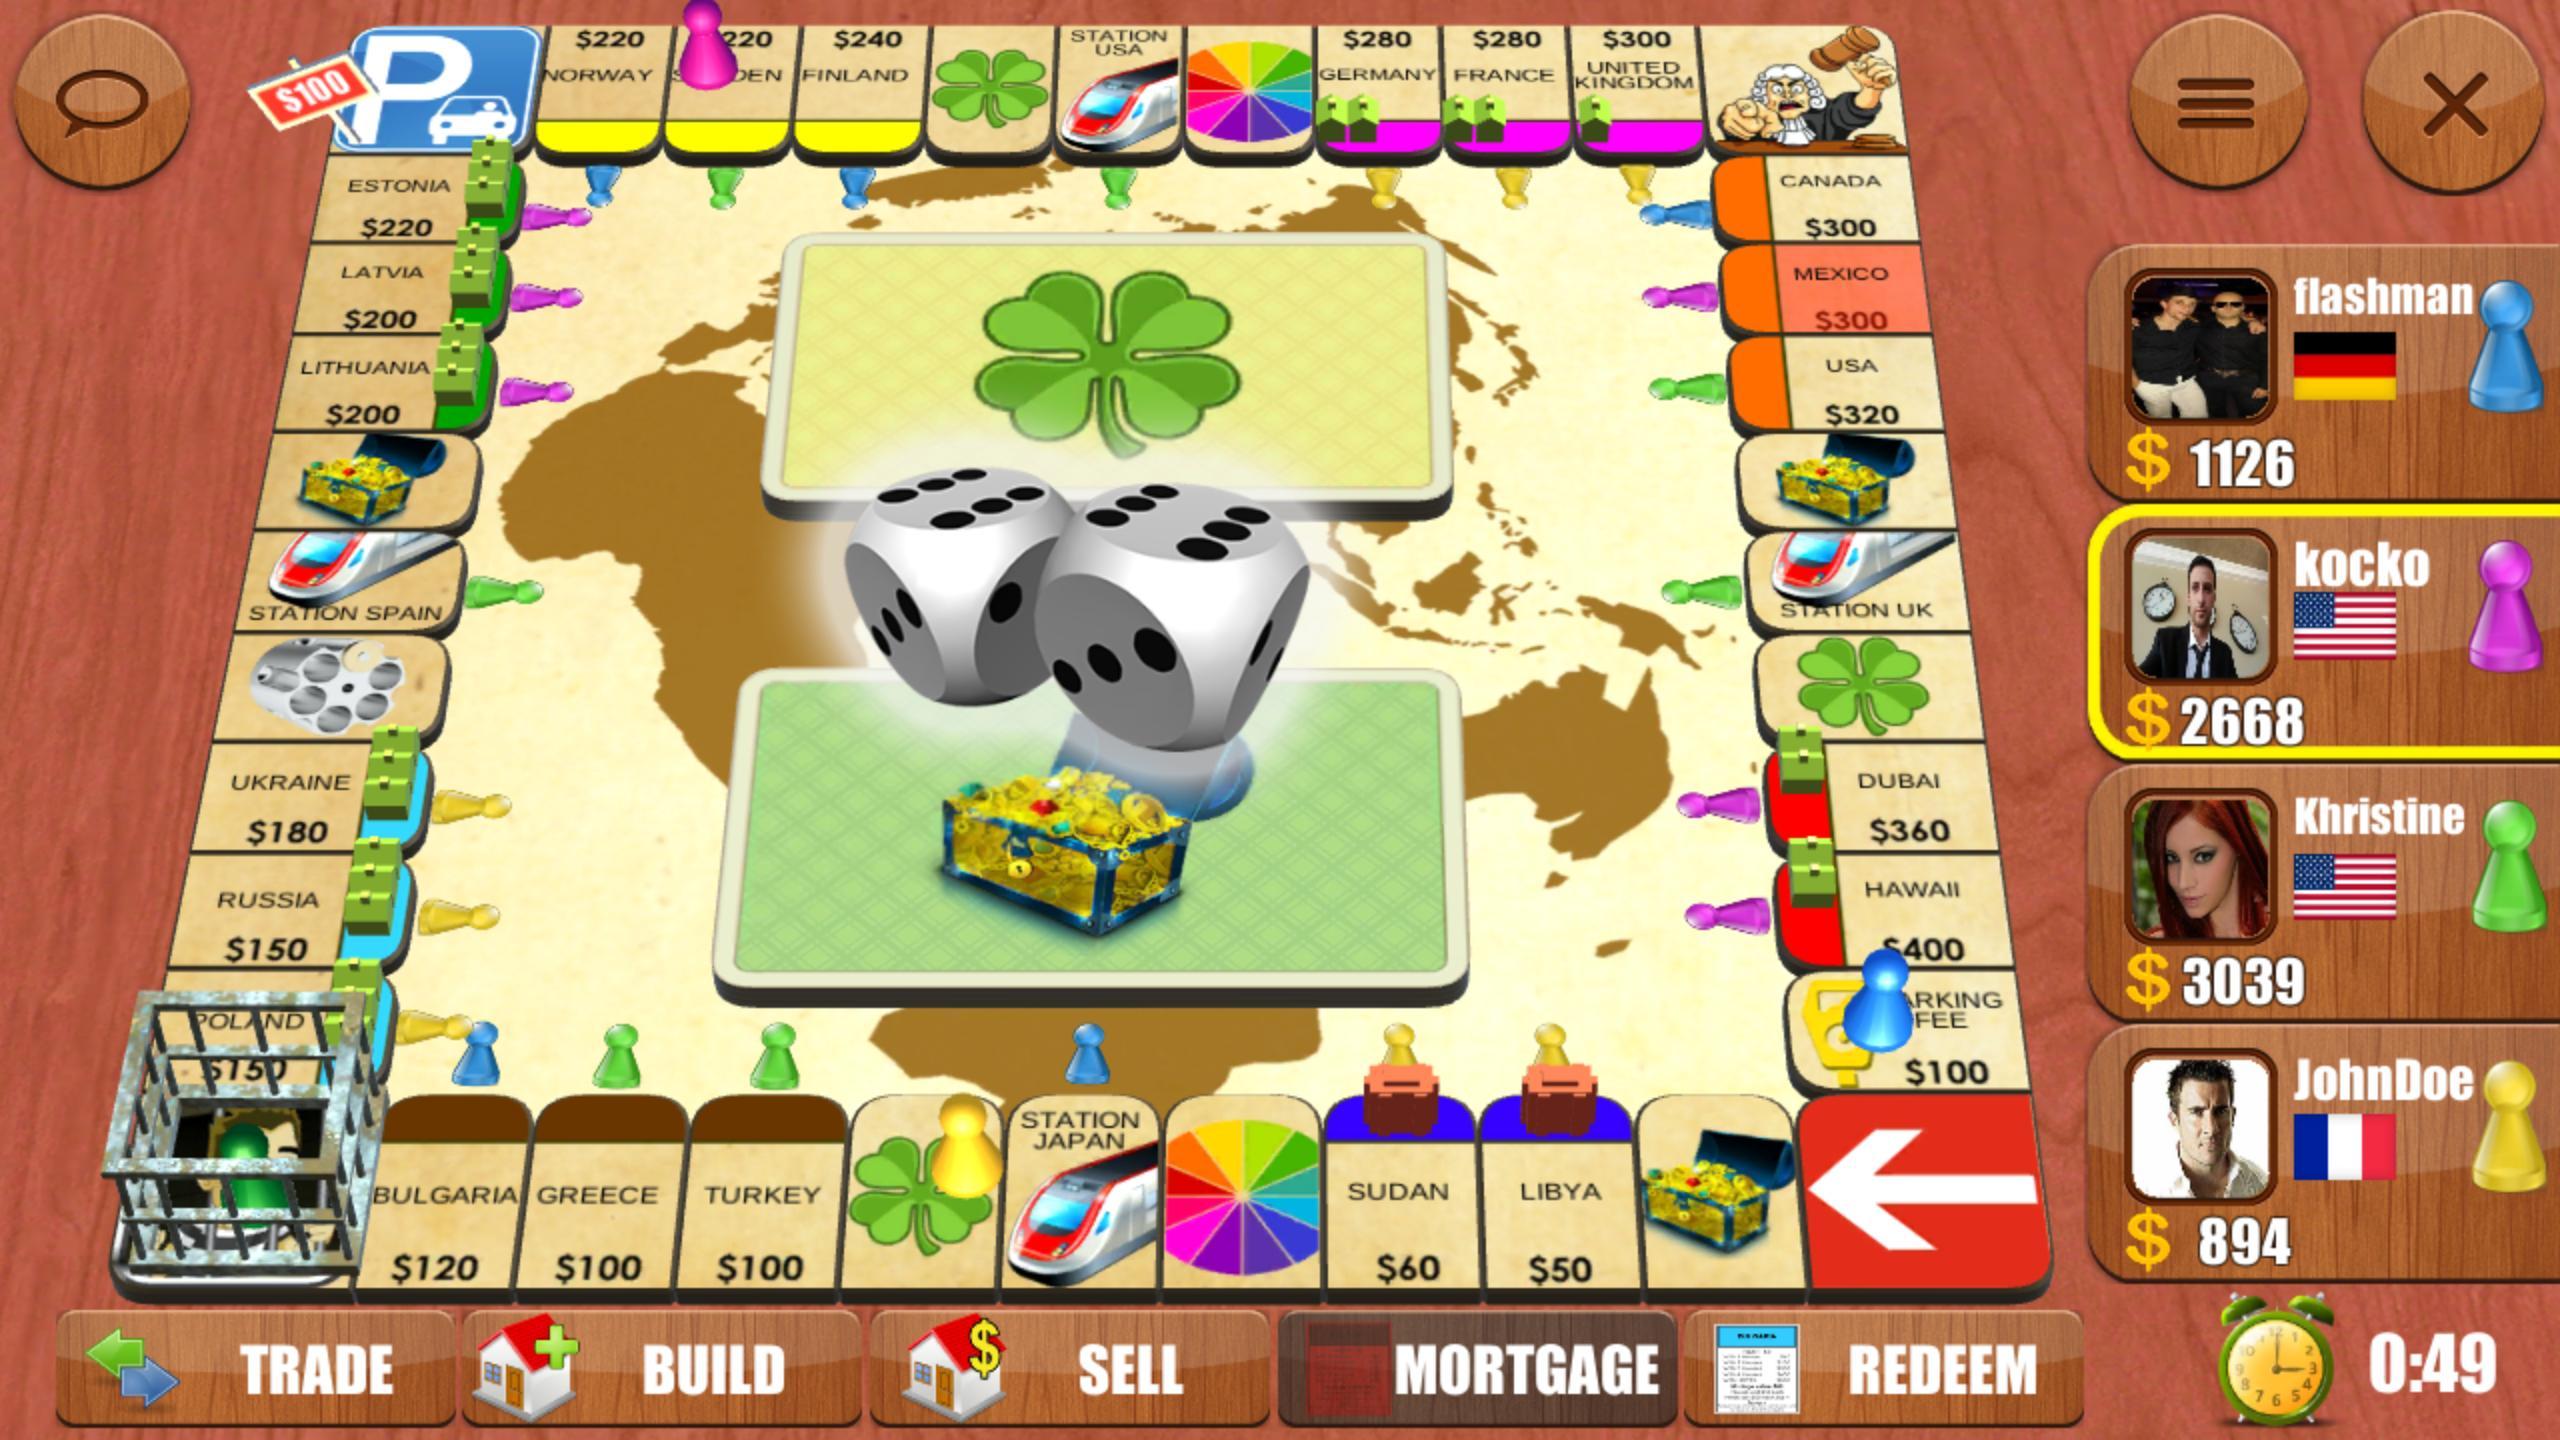 Rento Dice Board Game Online 5.1.9 Screenshot 9